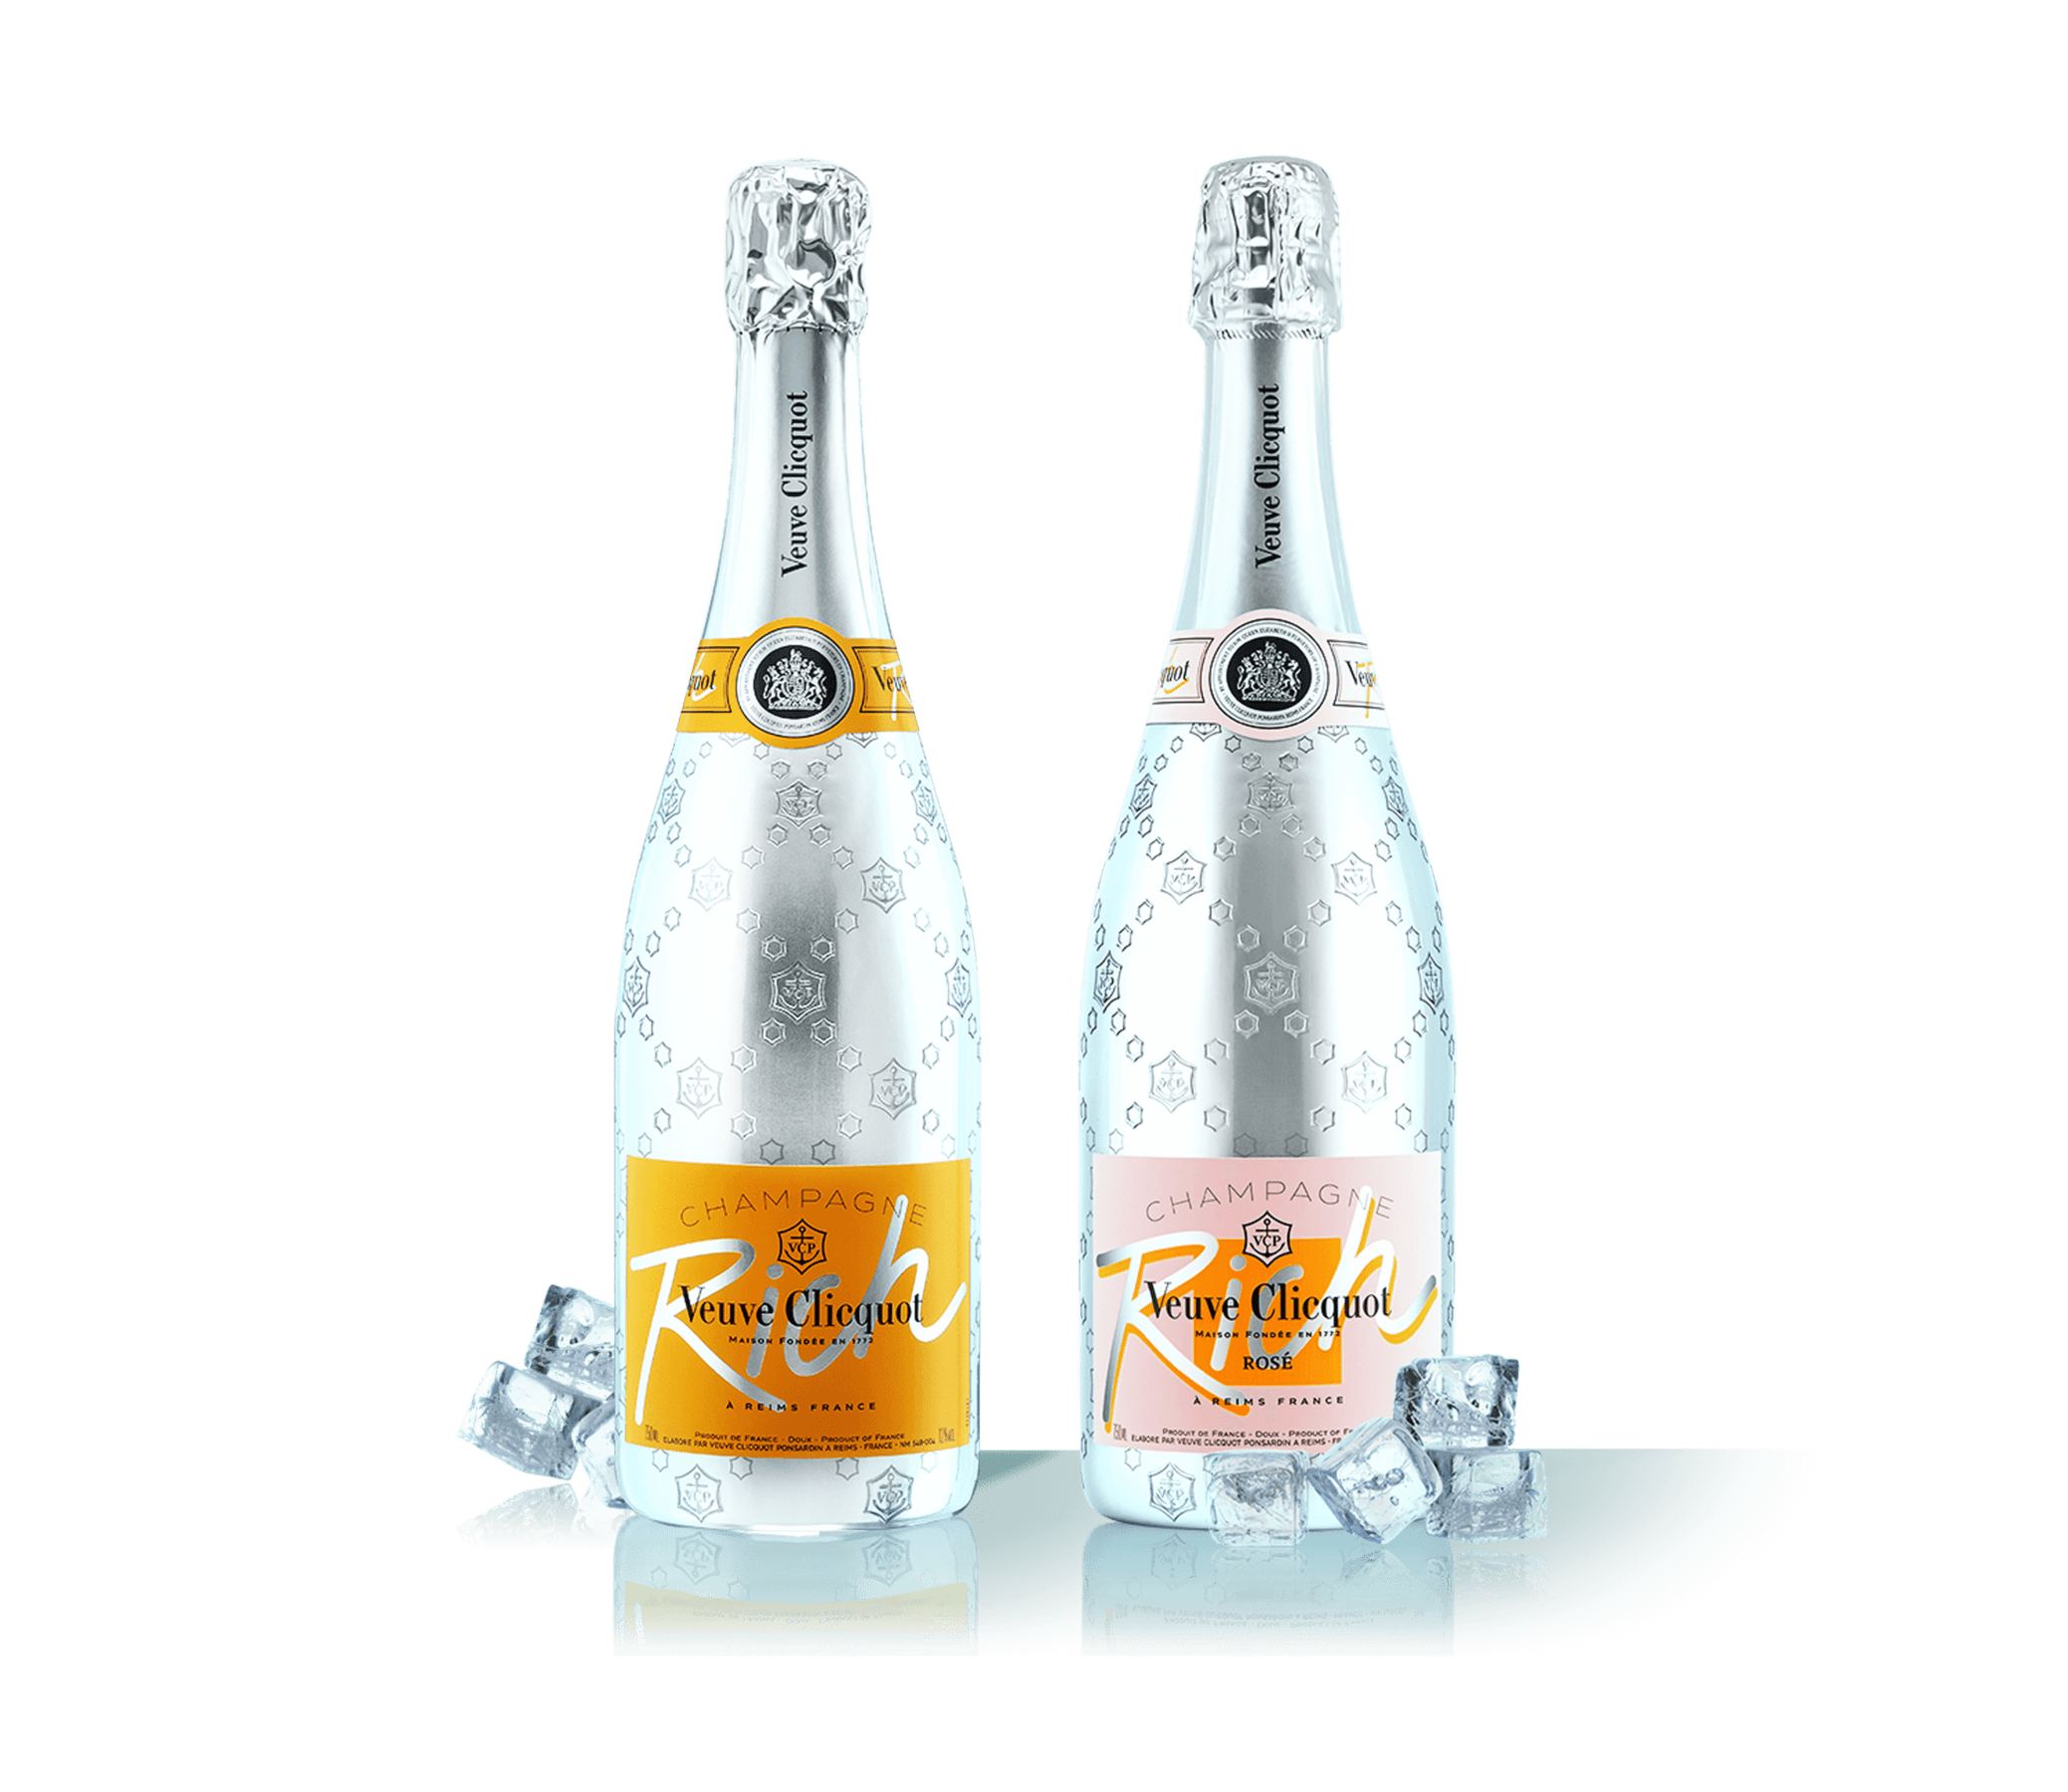 Garrafas do Champagne Veuve Clicquot Rich